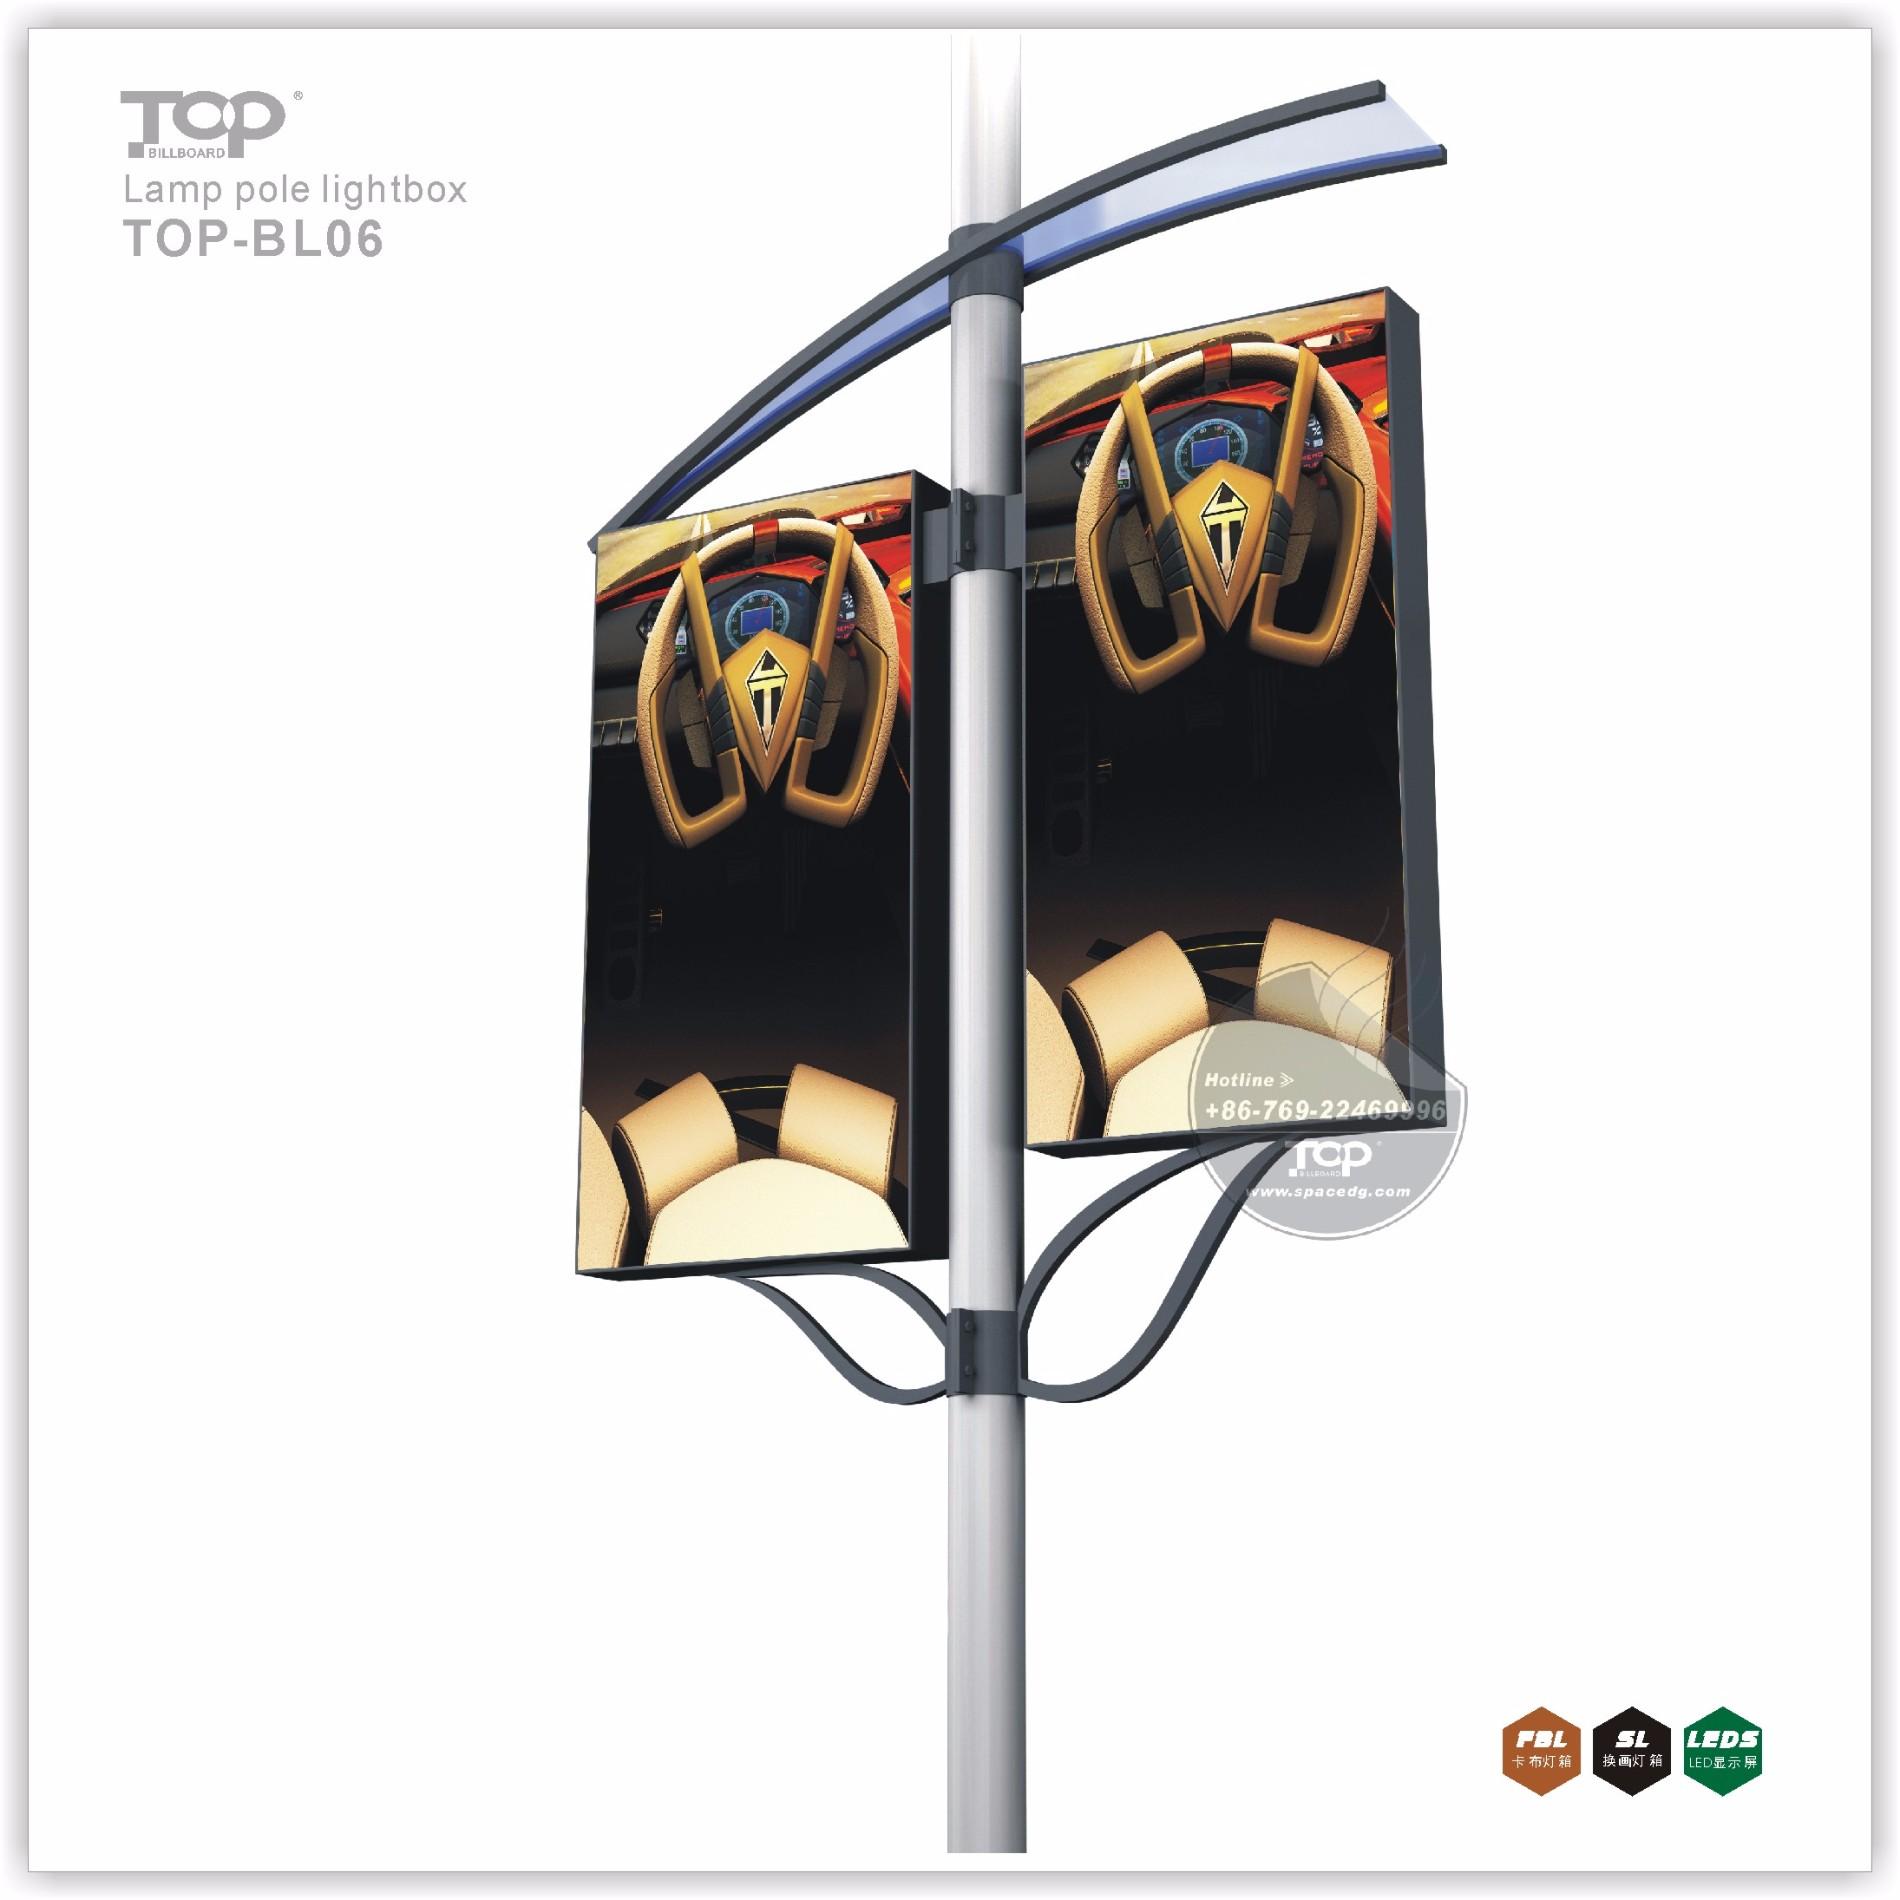 Panel Lamp Pole Advertising Solar Light Box